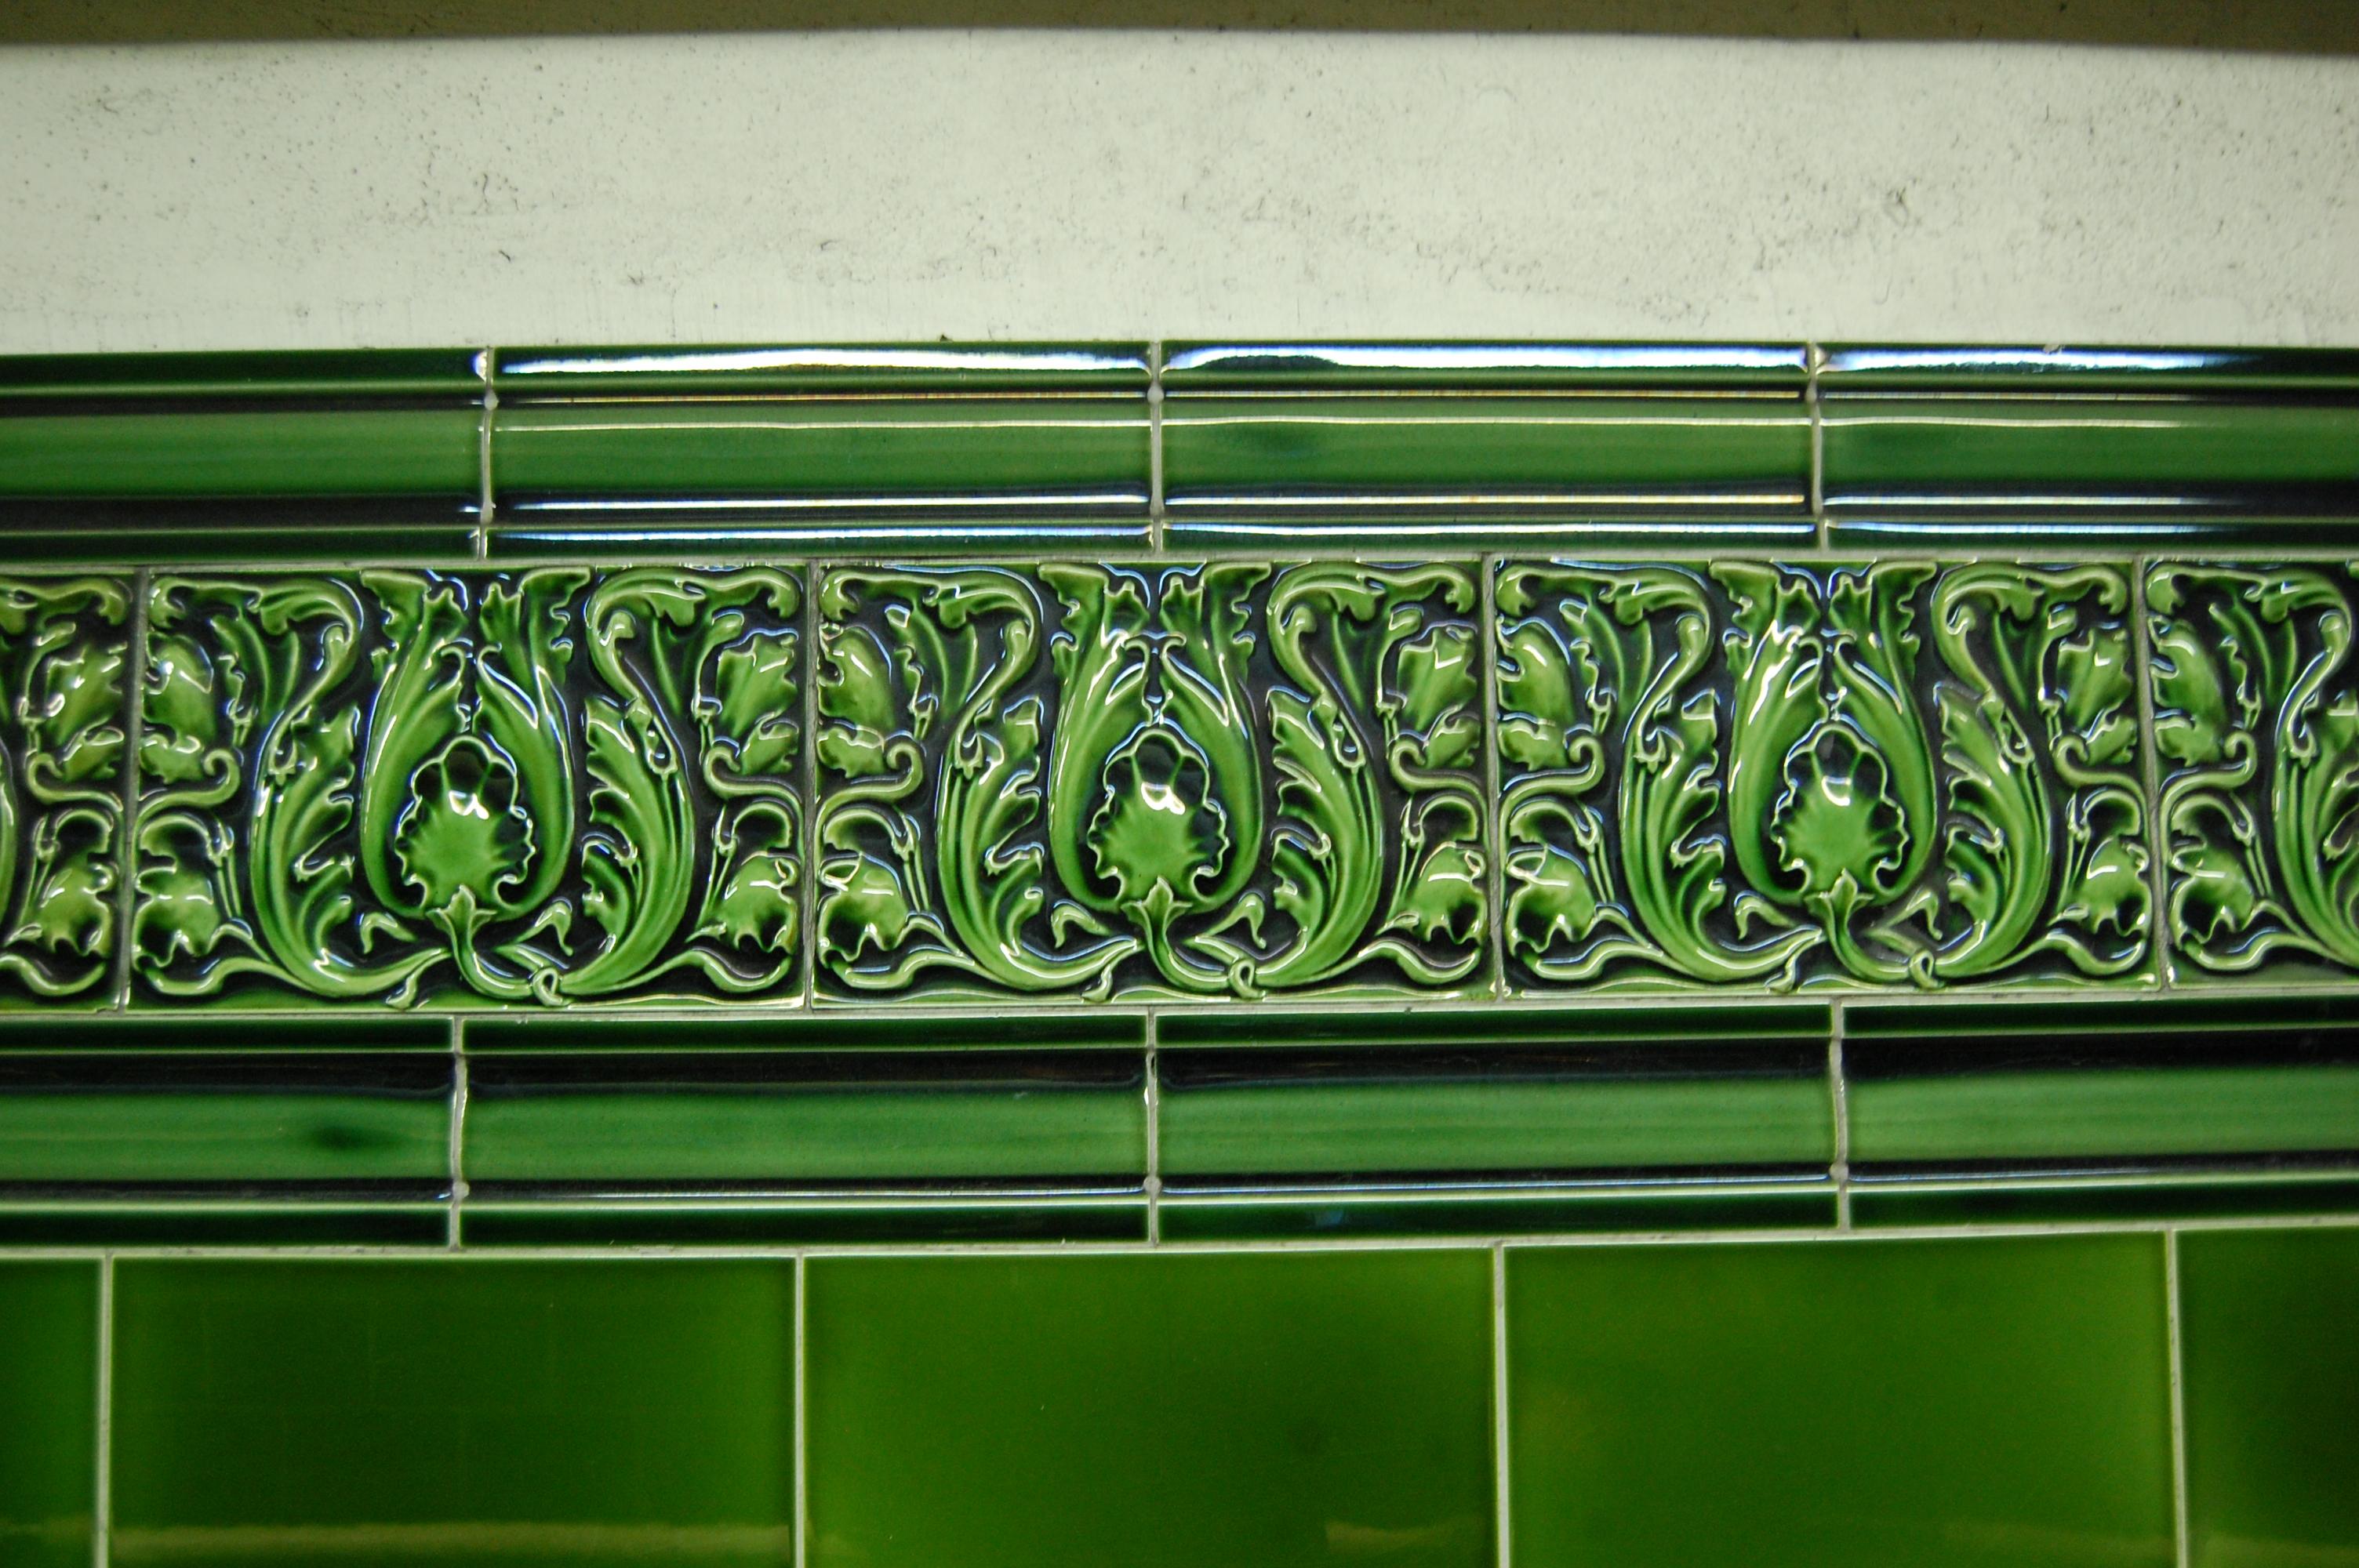 The Green Agenda Leslie Green Underground Stations